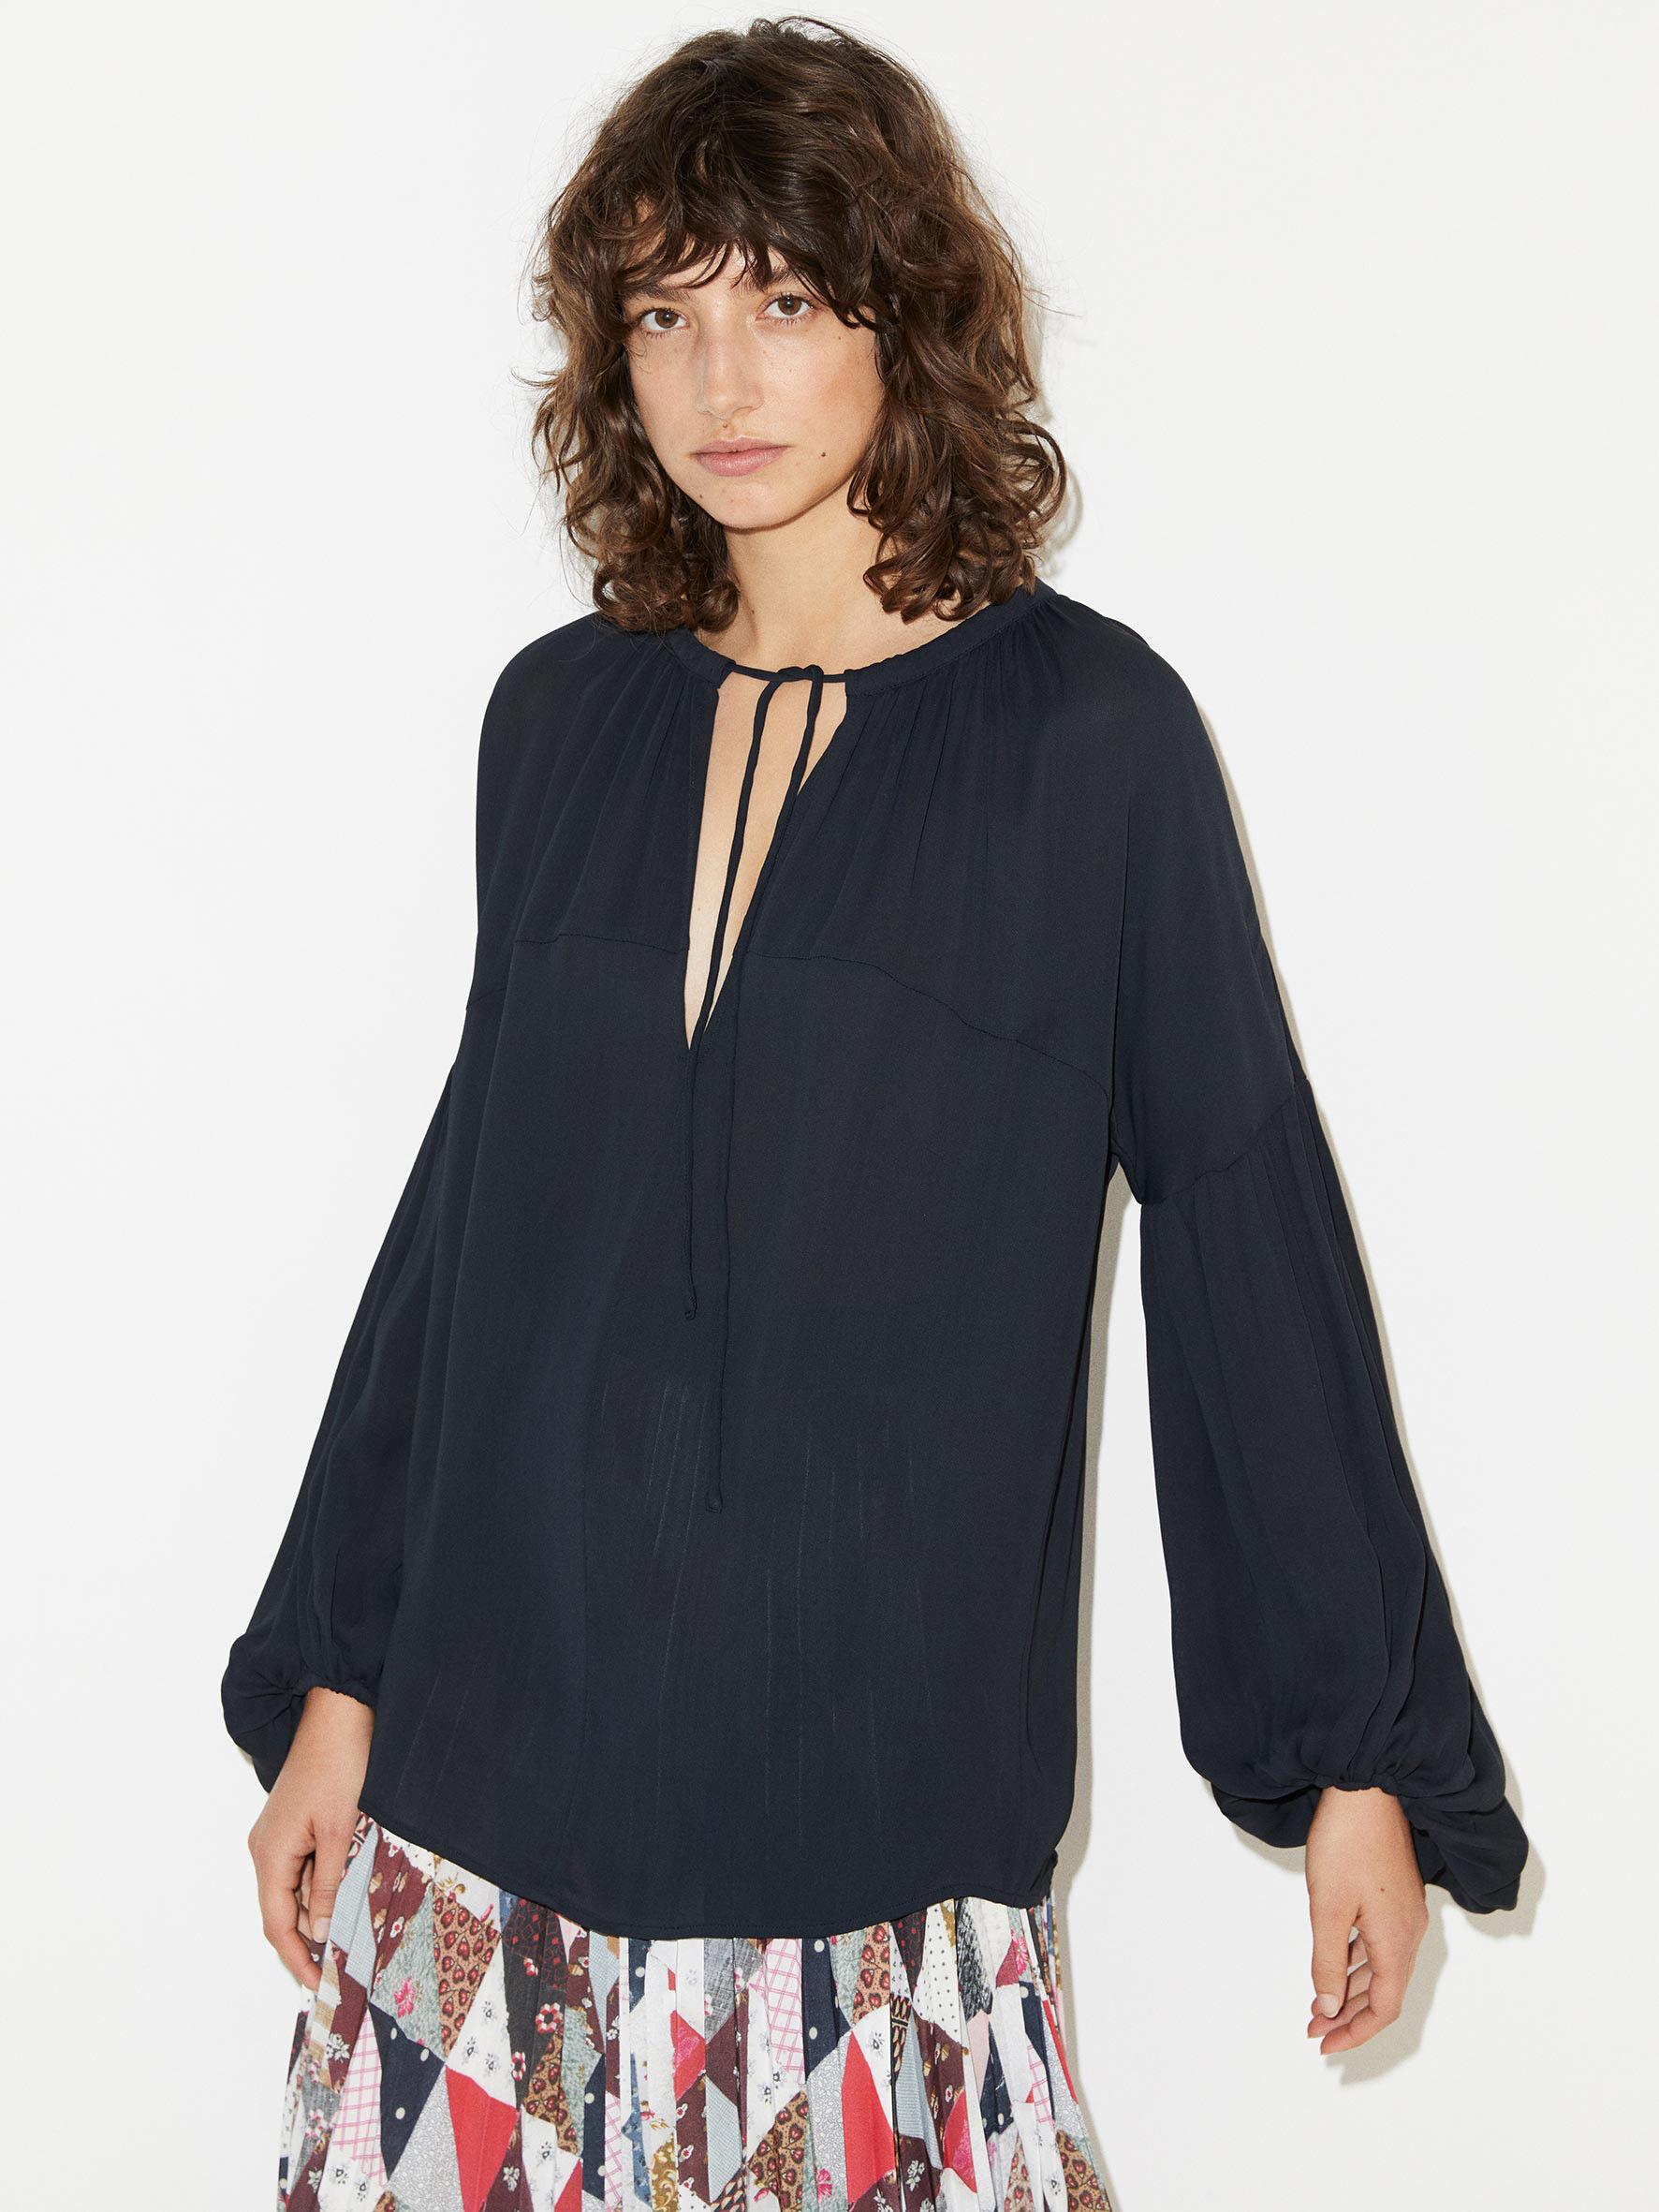 Kyra top Buy Partywear online